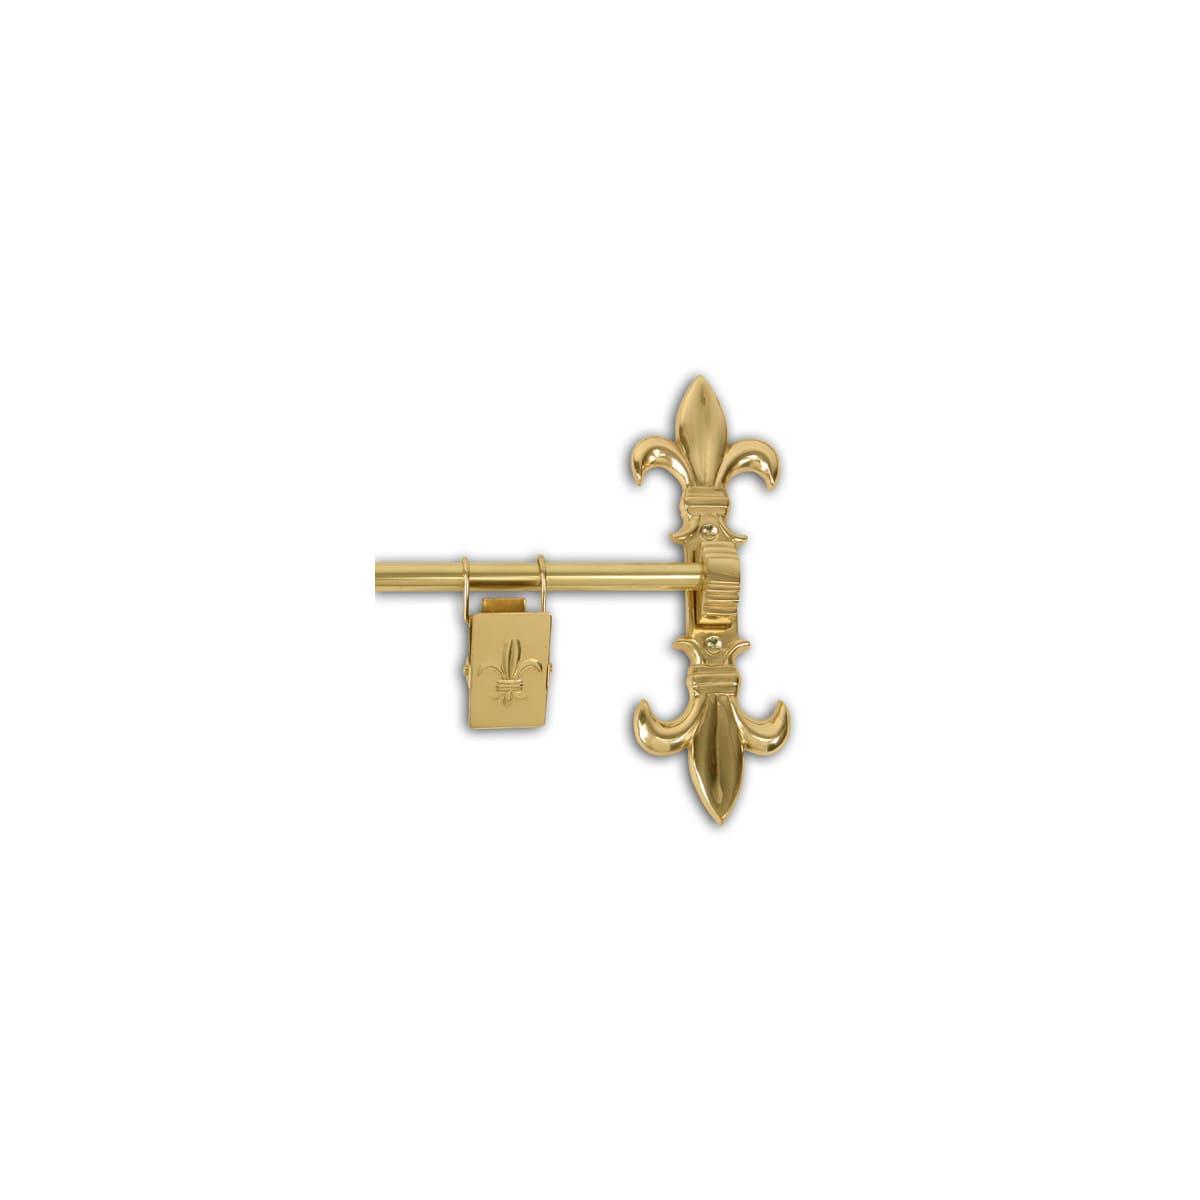 Brass Elegans 33th2 Ab Antique Brass 48 Solid Brass